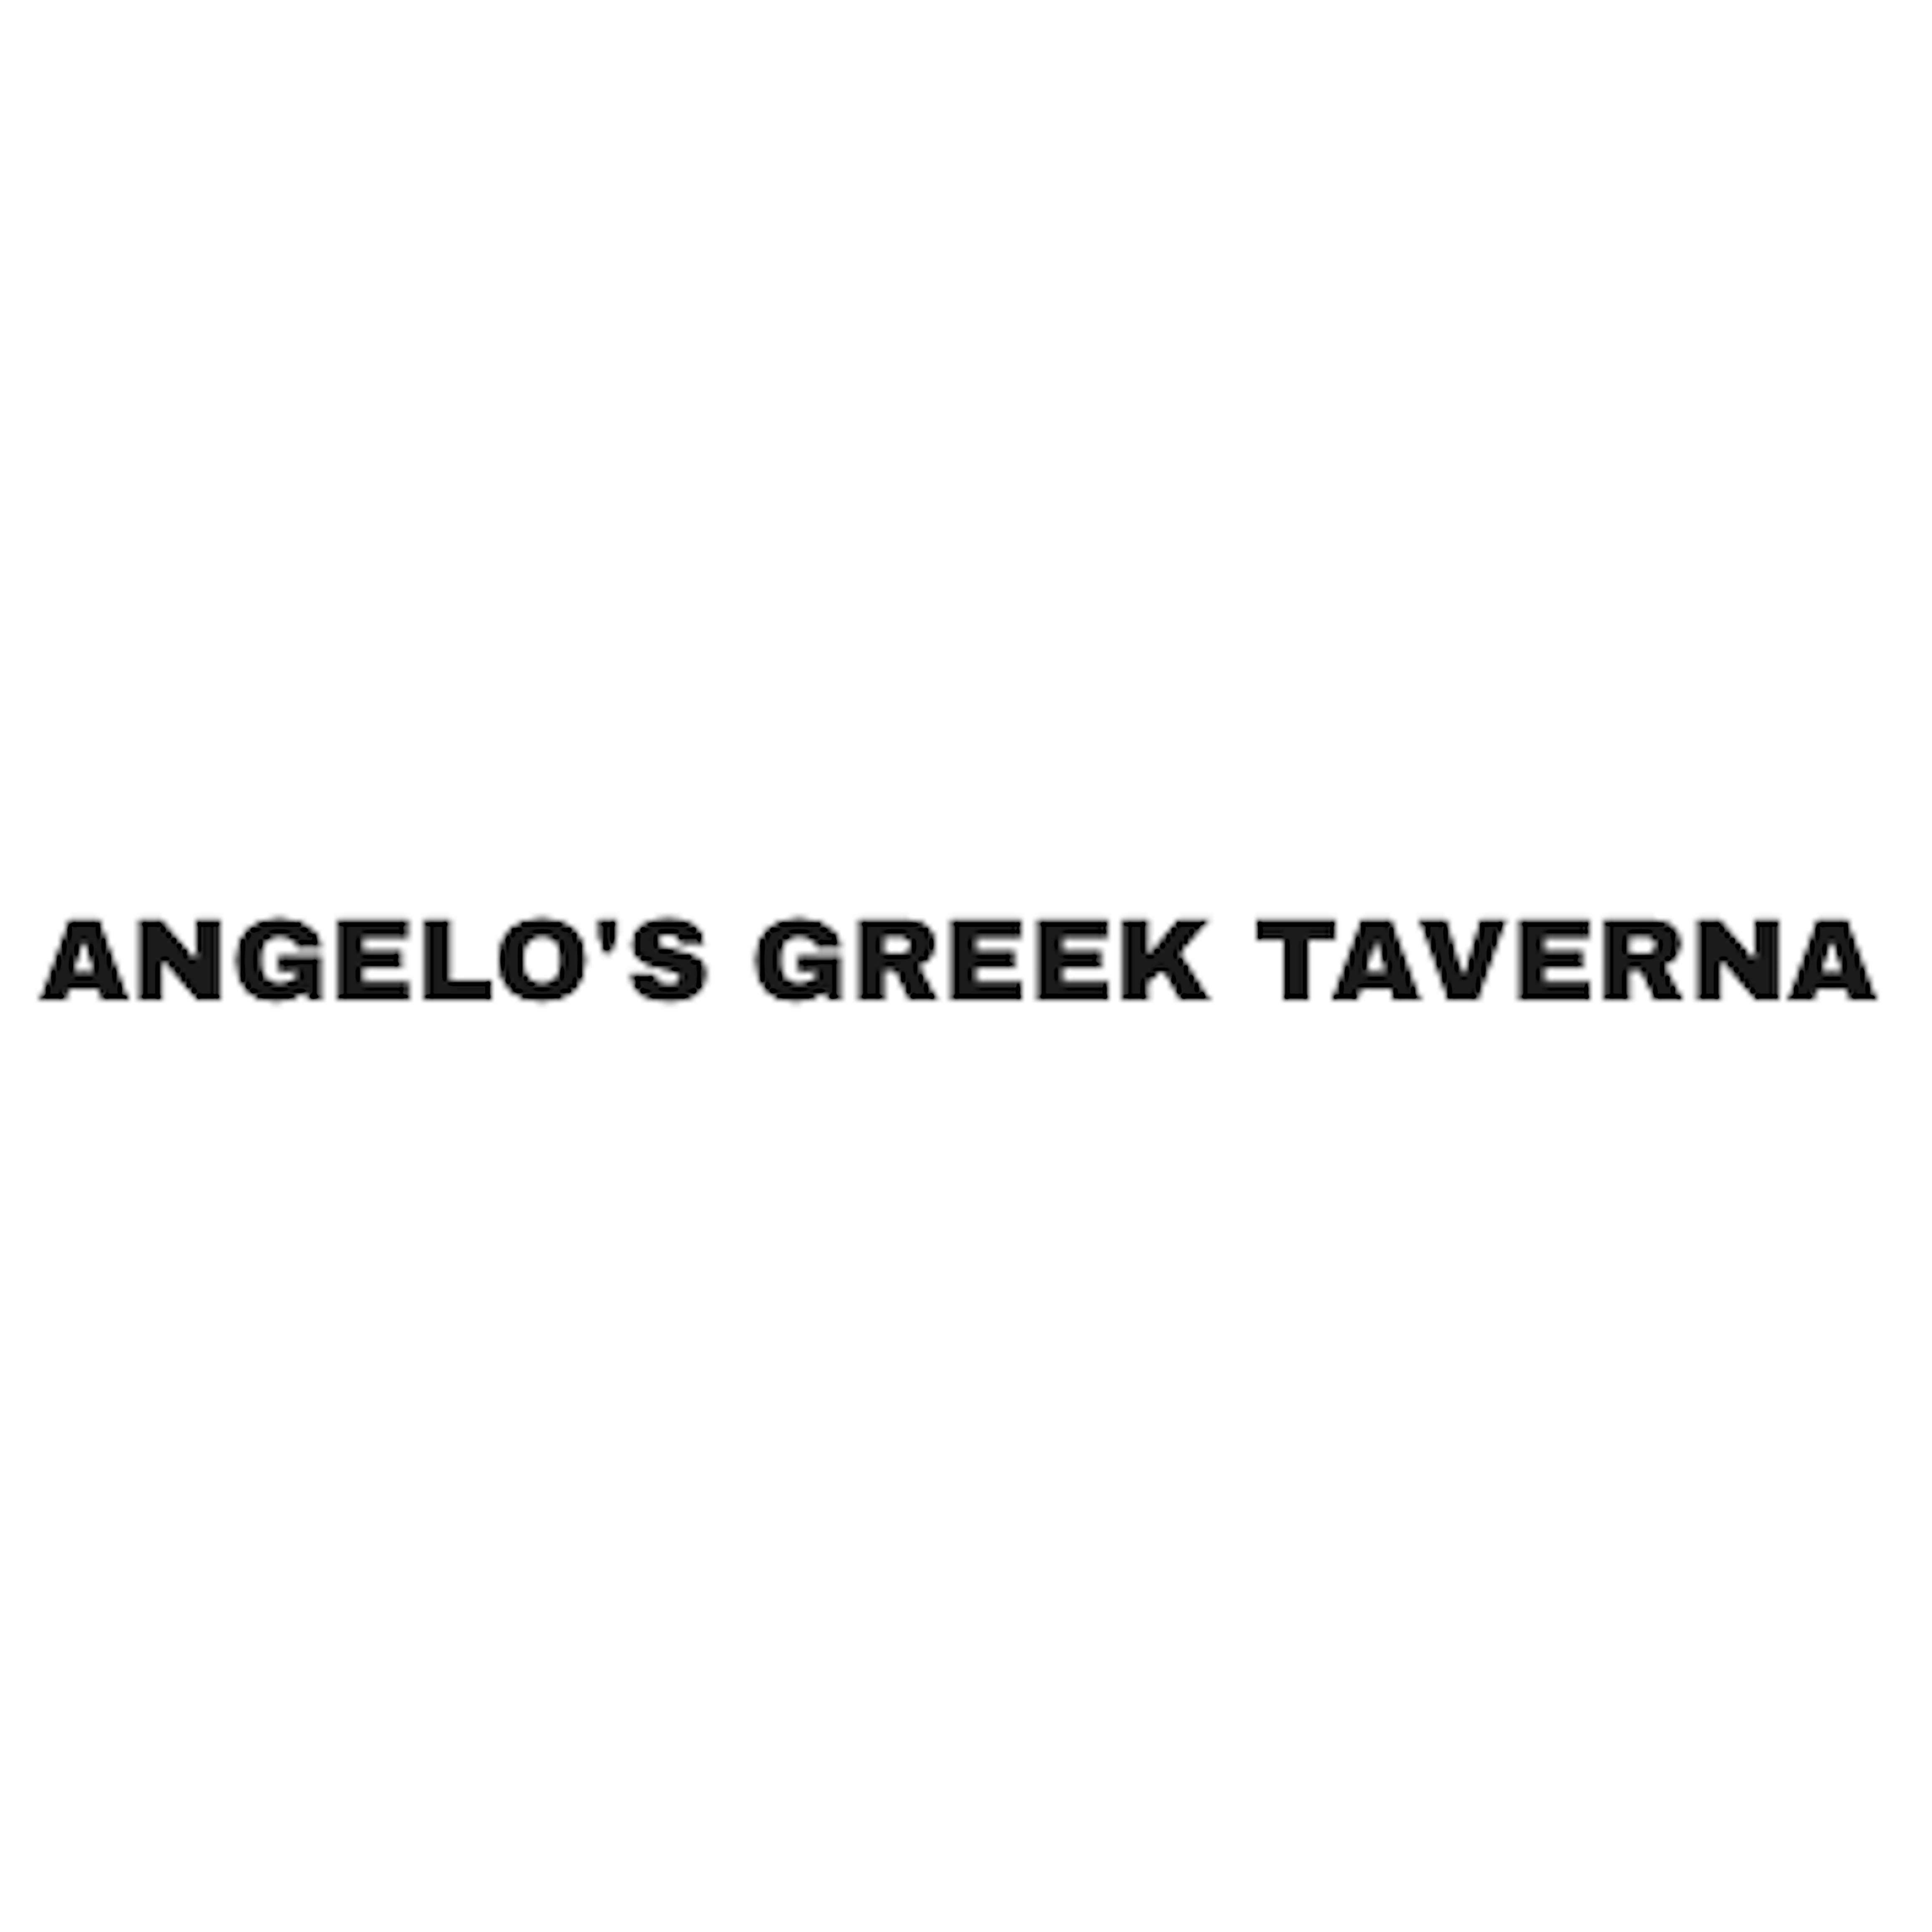 Angelo's Greek Taverna image 6